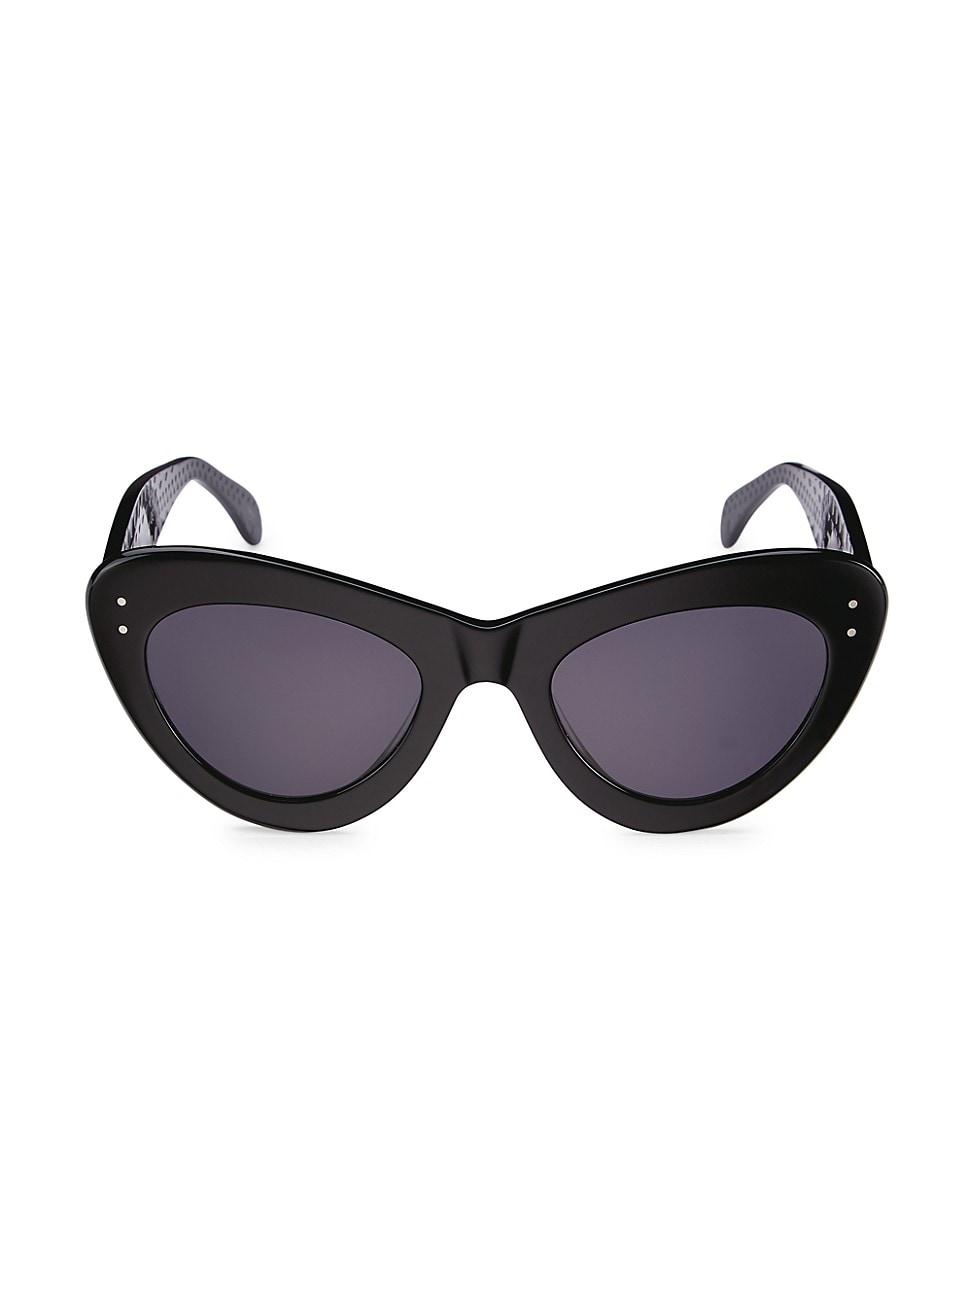 Alaïa 52mm Cat Eye Sunglasses In Black